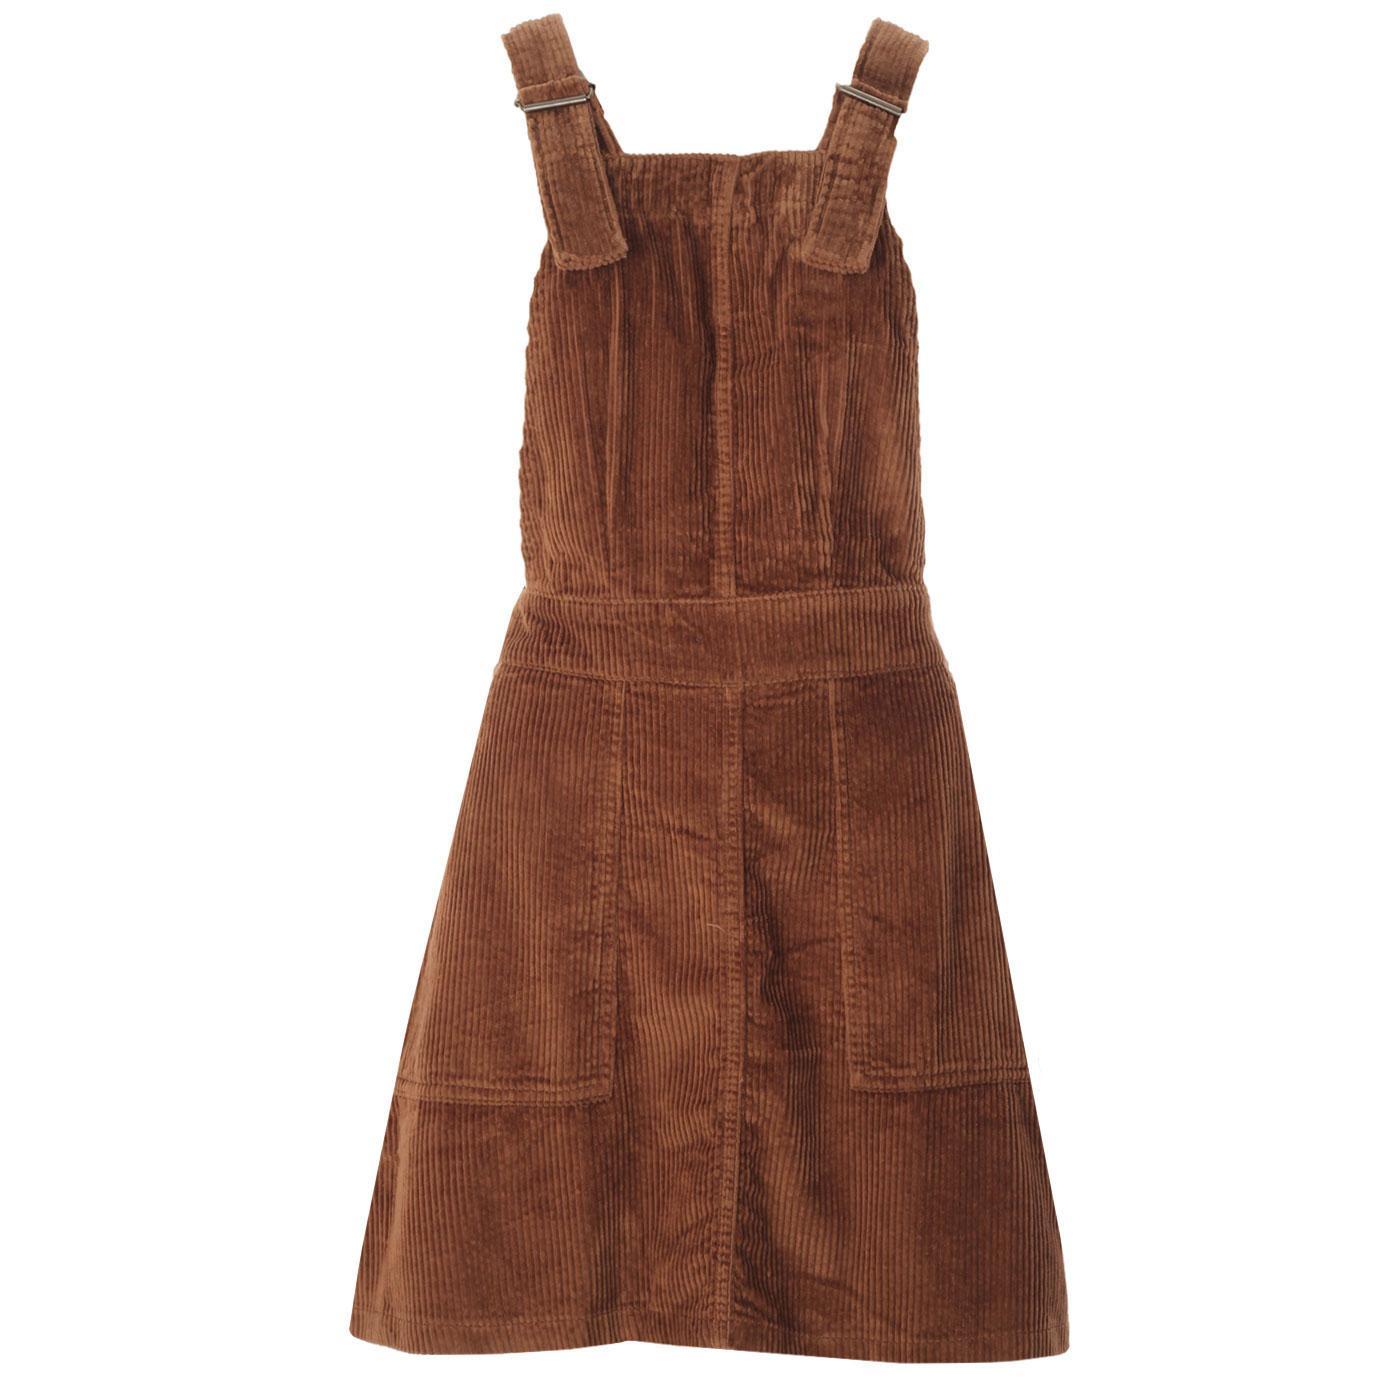 Marlo MADCAP ENGLAND 1960s Cord Pinafore Dress (T)